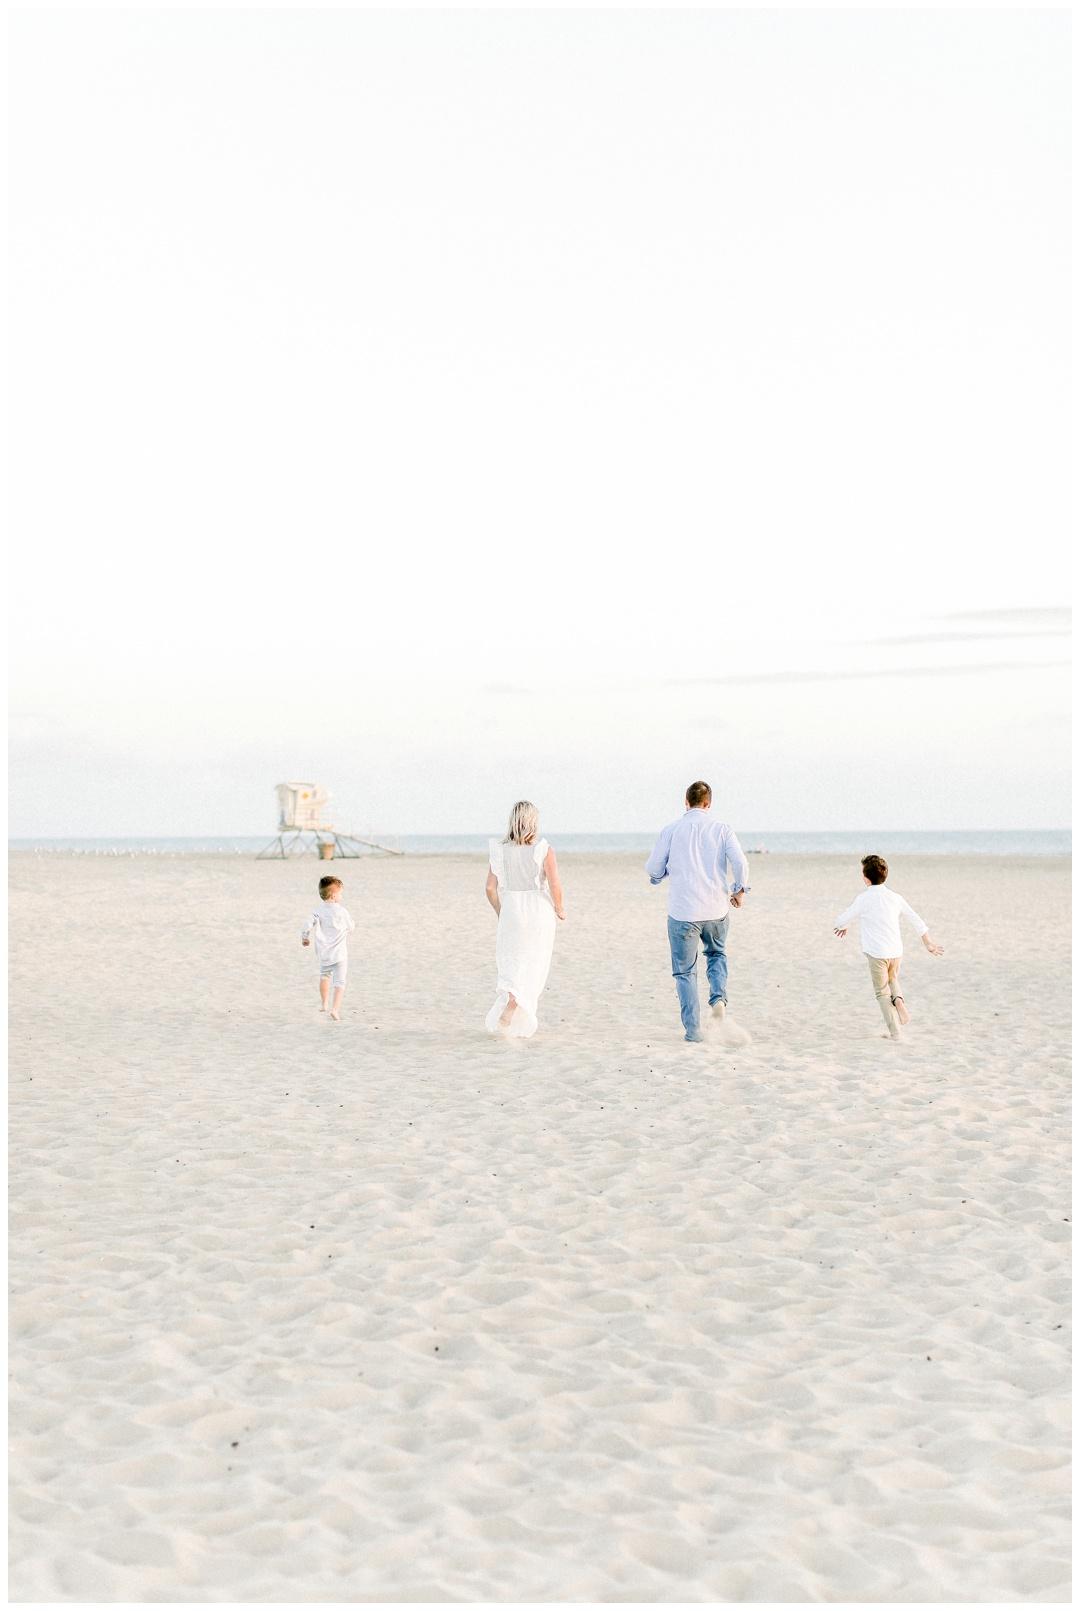 Newport_Beach_Family_Photographer_Newport_Beach_Newborn_Photographer_Orange_County_Family_Photographer_Cori_Kleckner_Photography_Huntington_Beach_San_Clemente_Family_Session_Photography__2333.jpg